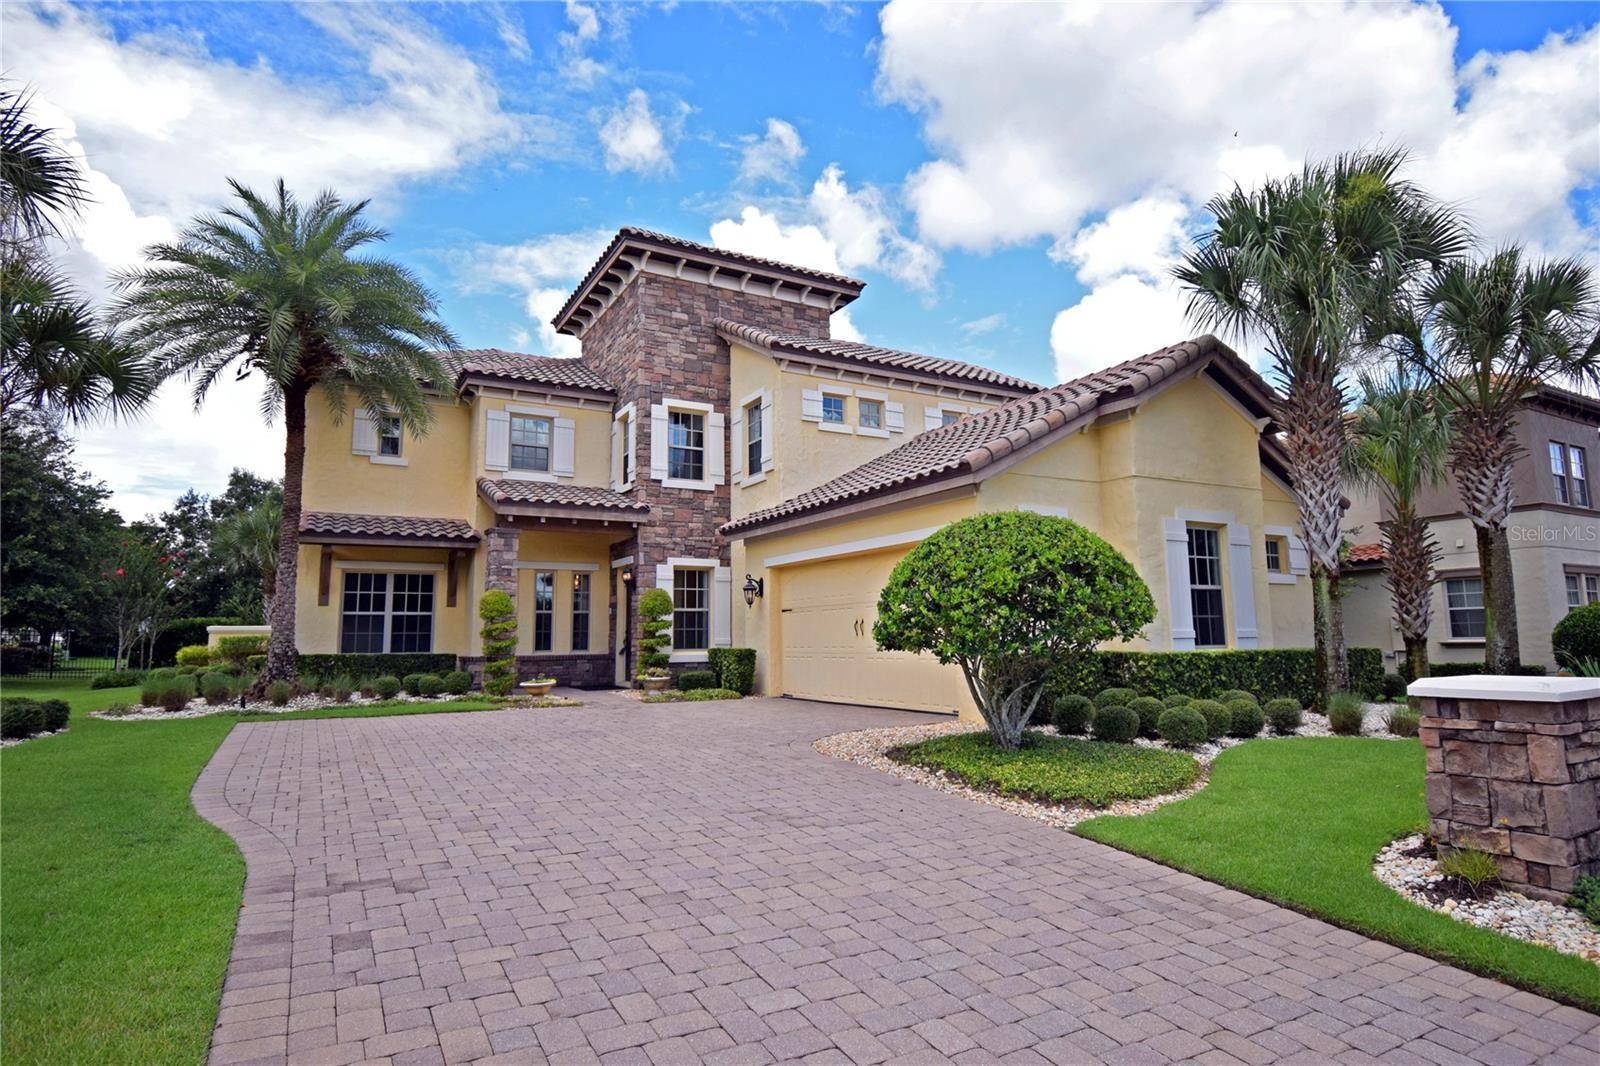 1811 LAURELTON HALL LANE, Winter Park, FL 32789 - #: O5956298